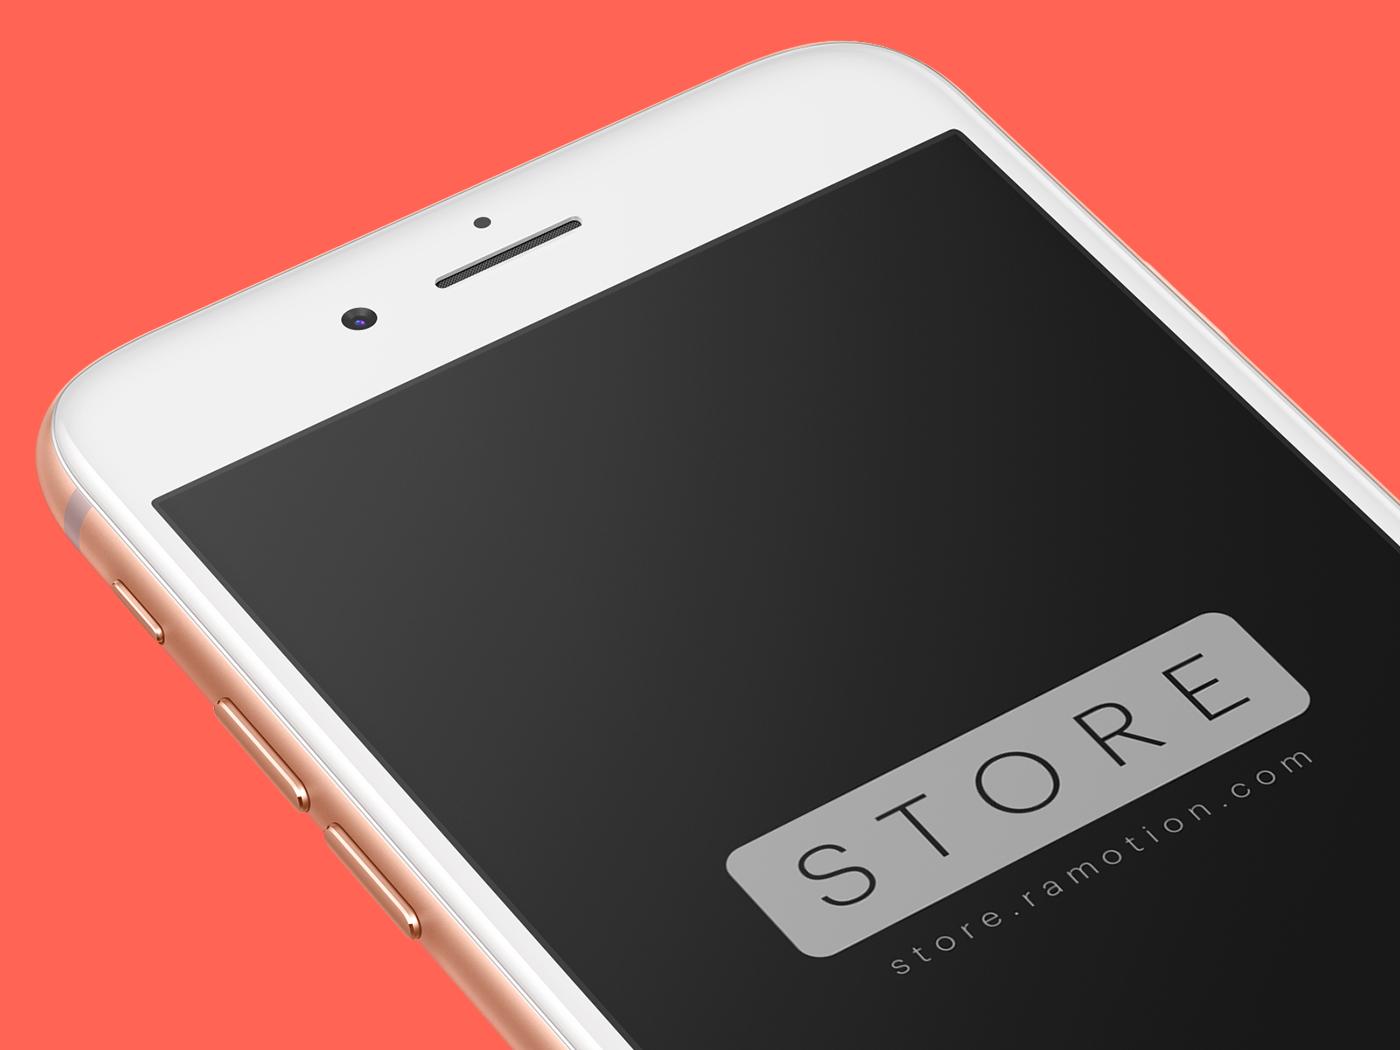 Iphone 8 gold pesrpective mockup template psd